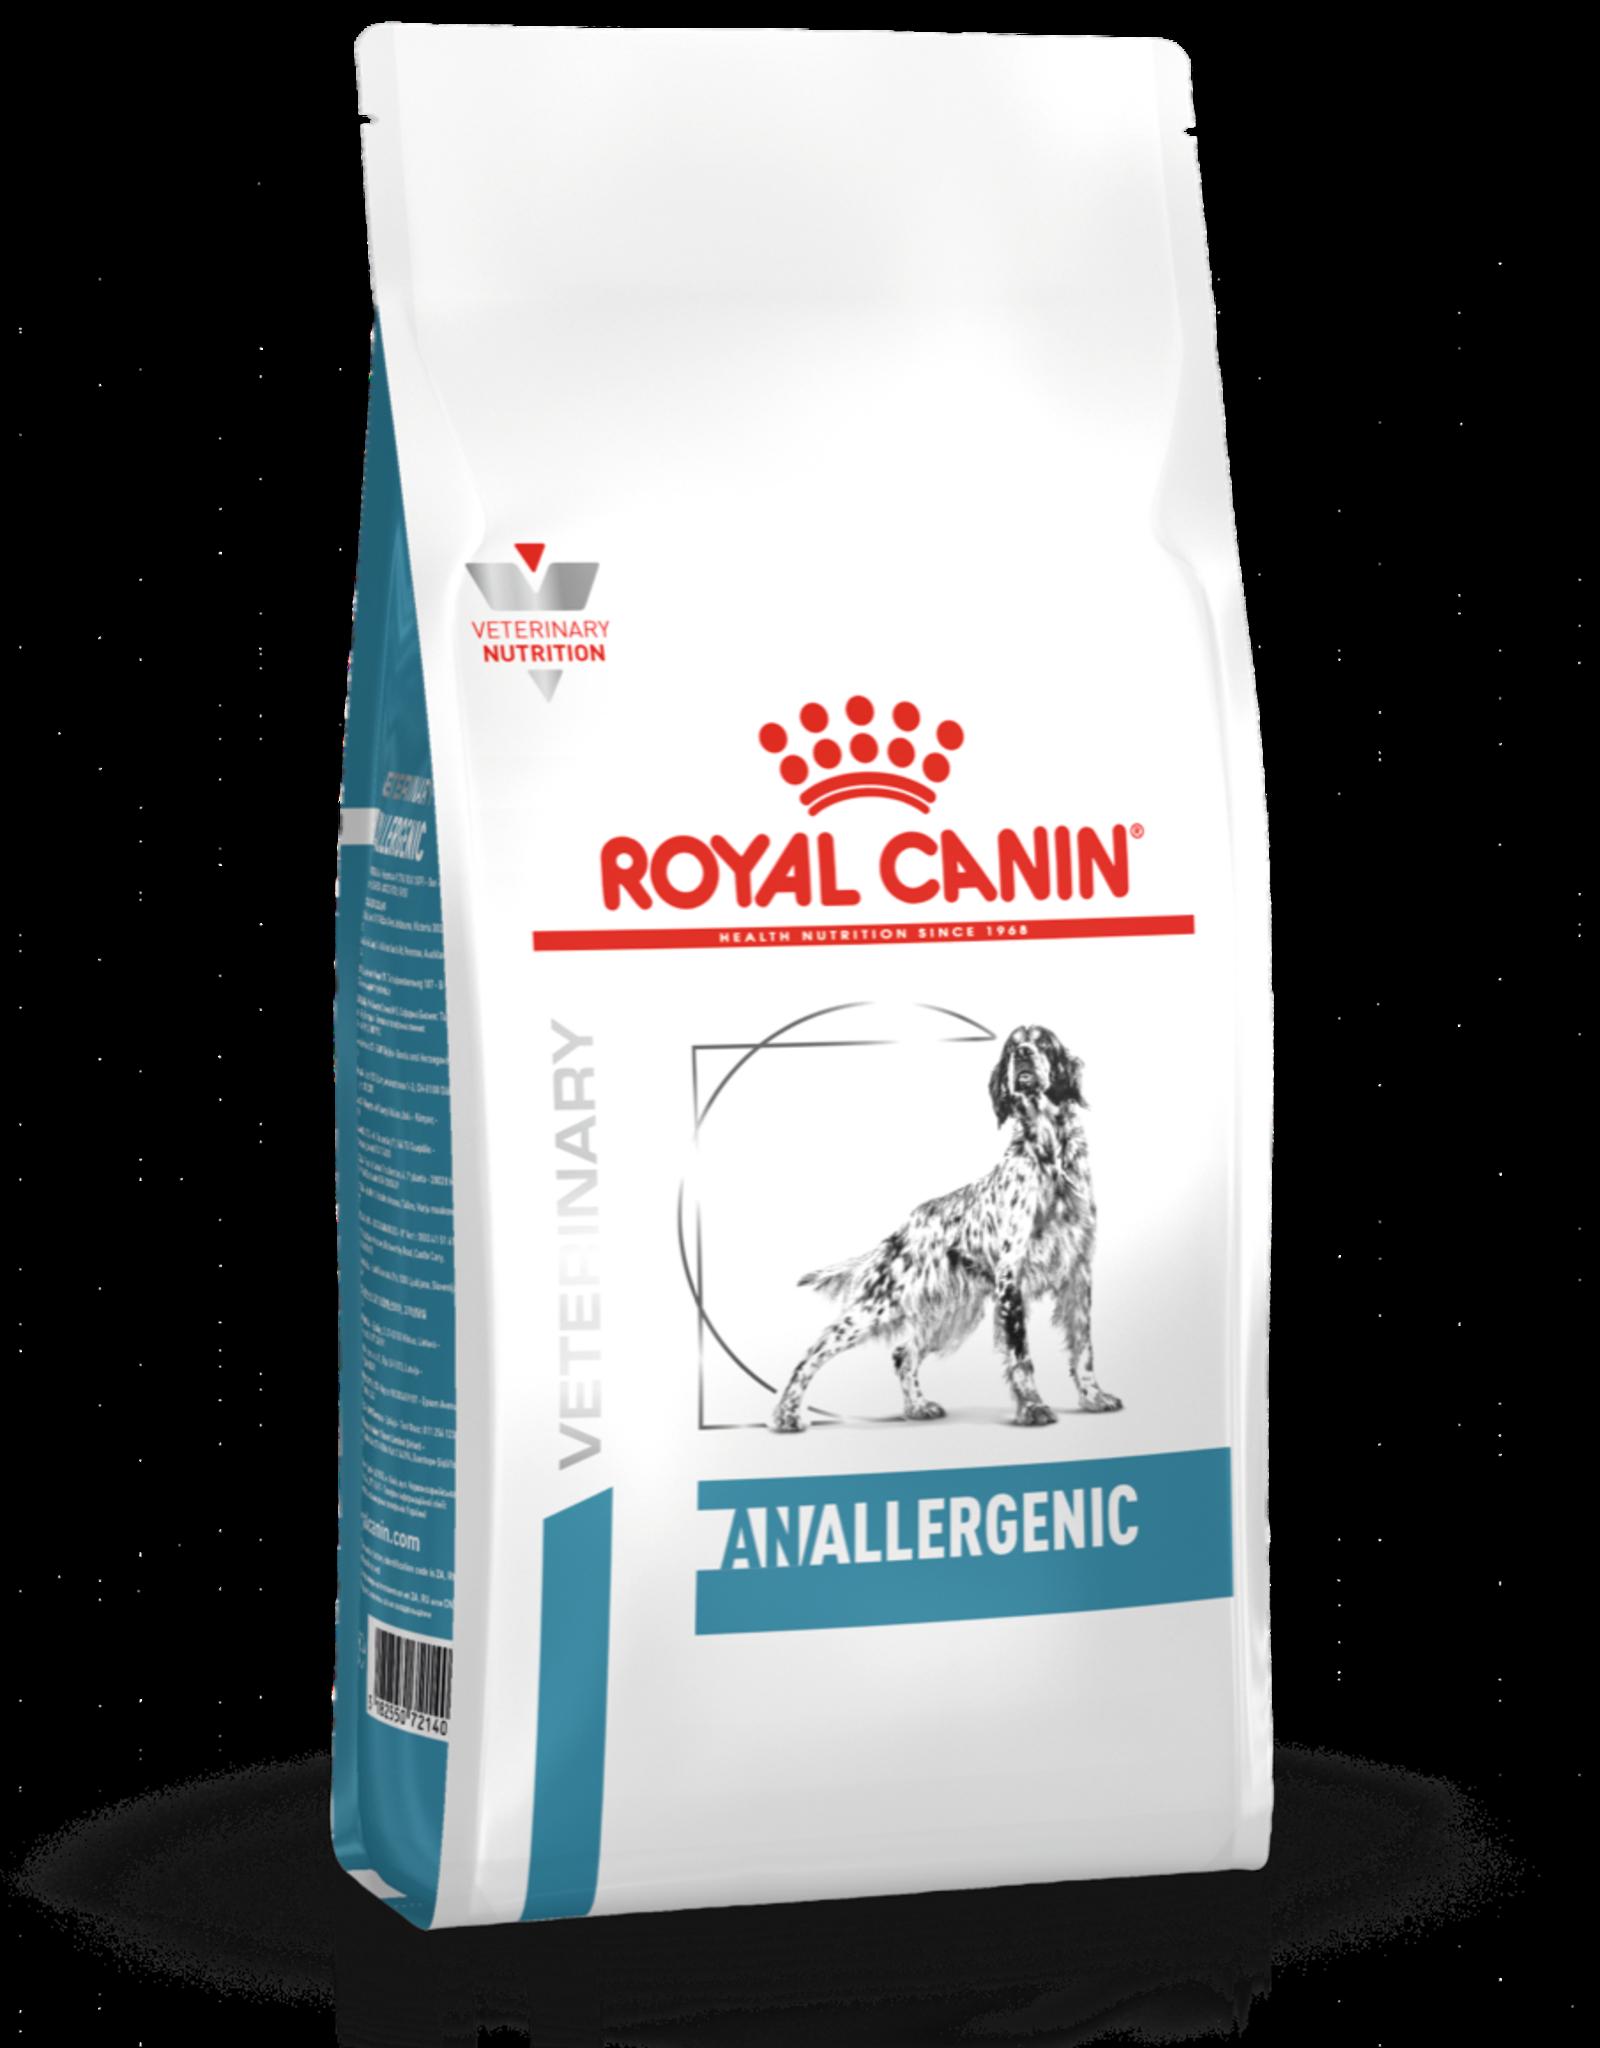 Royal Canin Royal Canin Anallergenic Dog 8kg